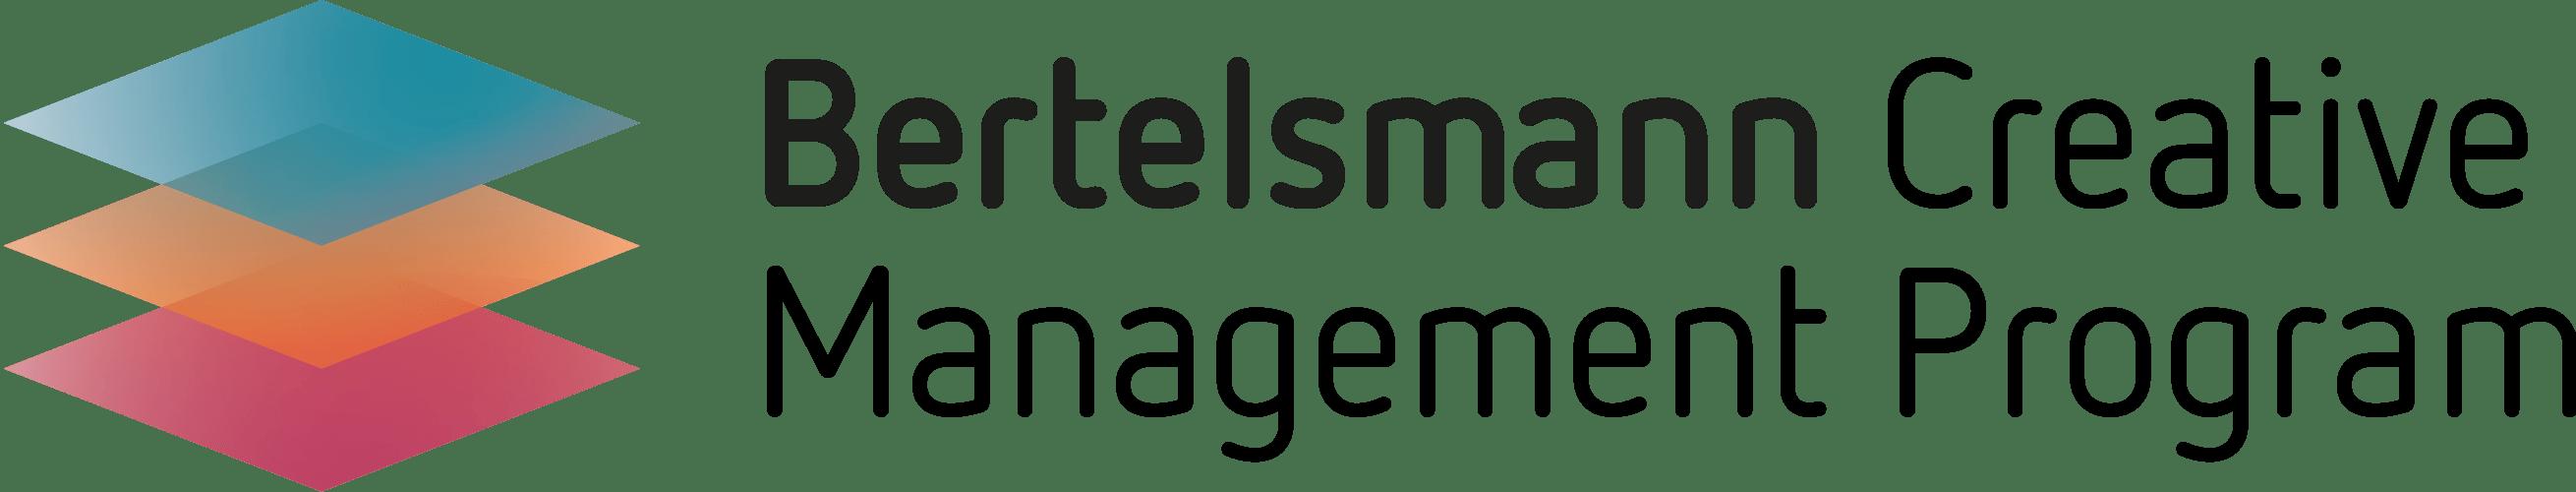 Bertelsmann Traineee, Creavtive Management Program Bertelsmann, high potential Bertelsmann, Traineeprogramm high potential